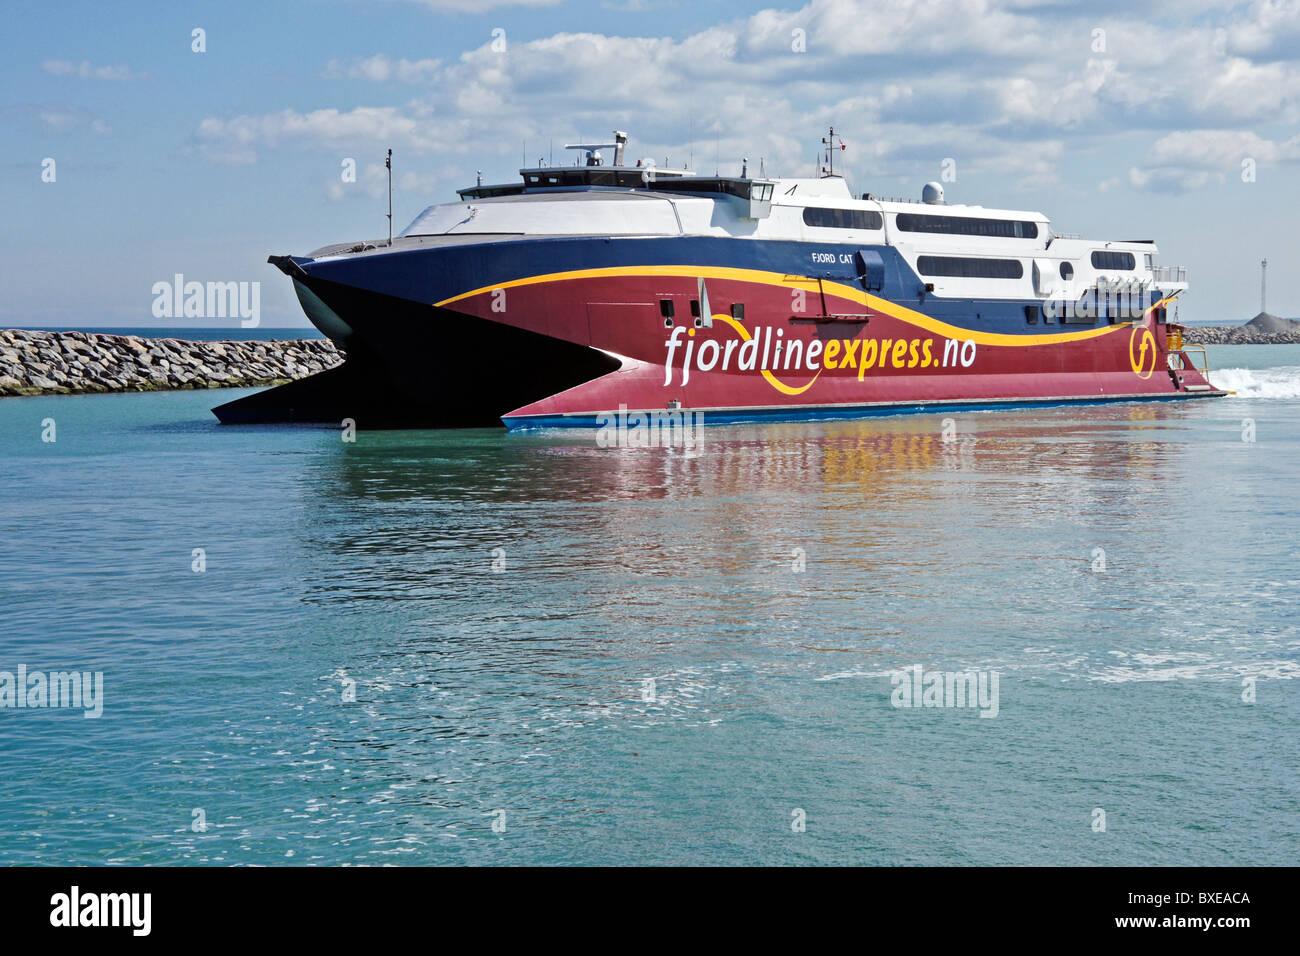 Fjordline high speed car and passenger ferry Fjord Cat leaving Hirtshals harbour in Jutland Denmark en route to - Stock Image